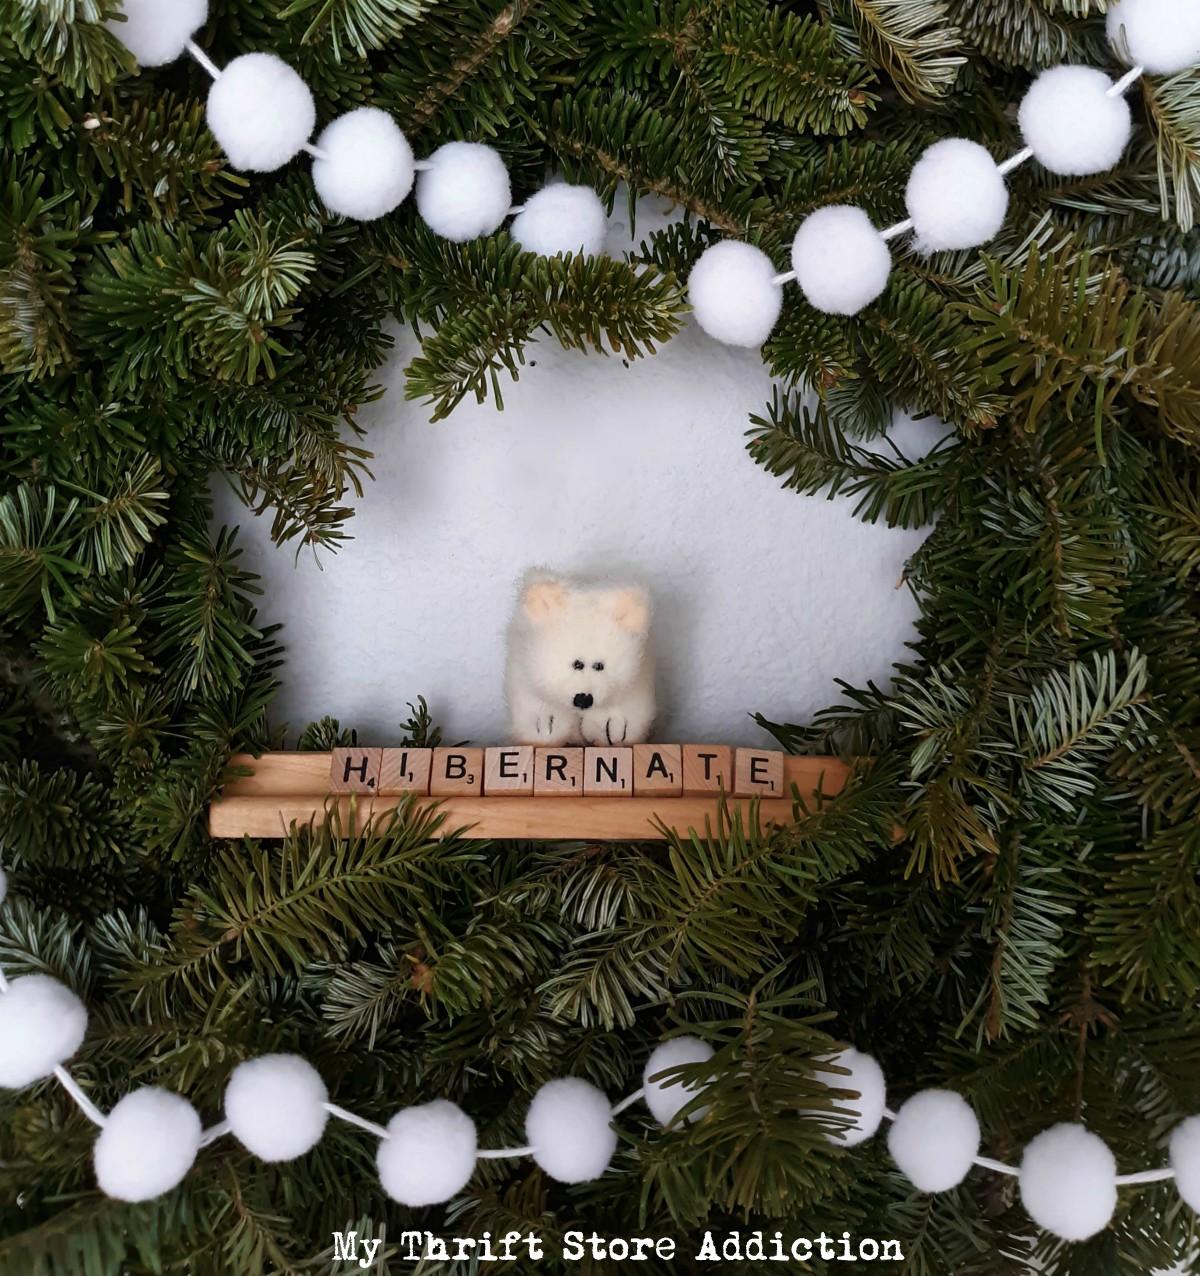 whimsical winter decor